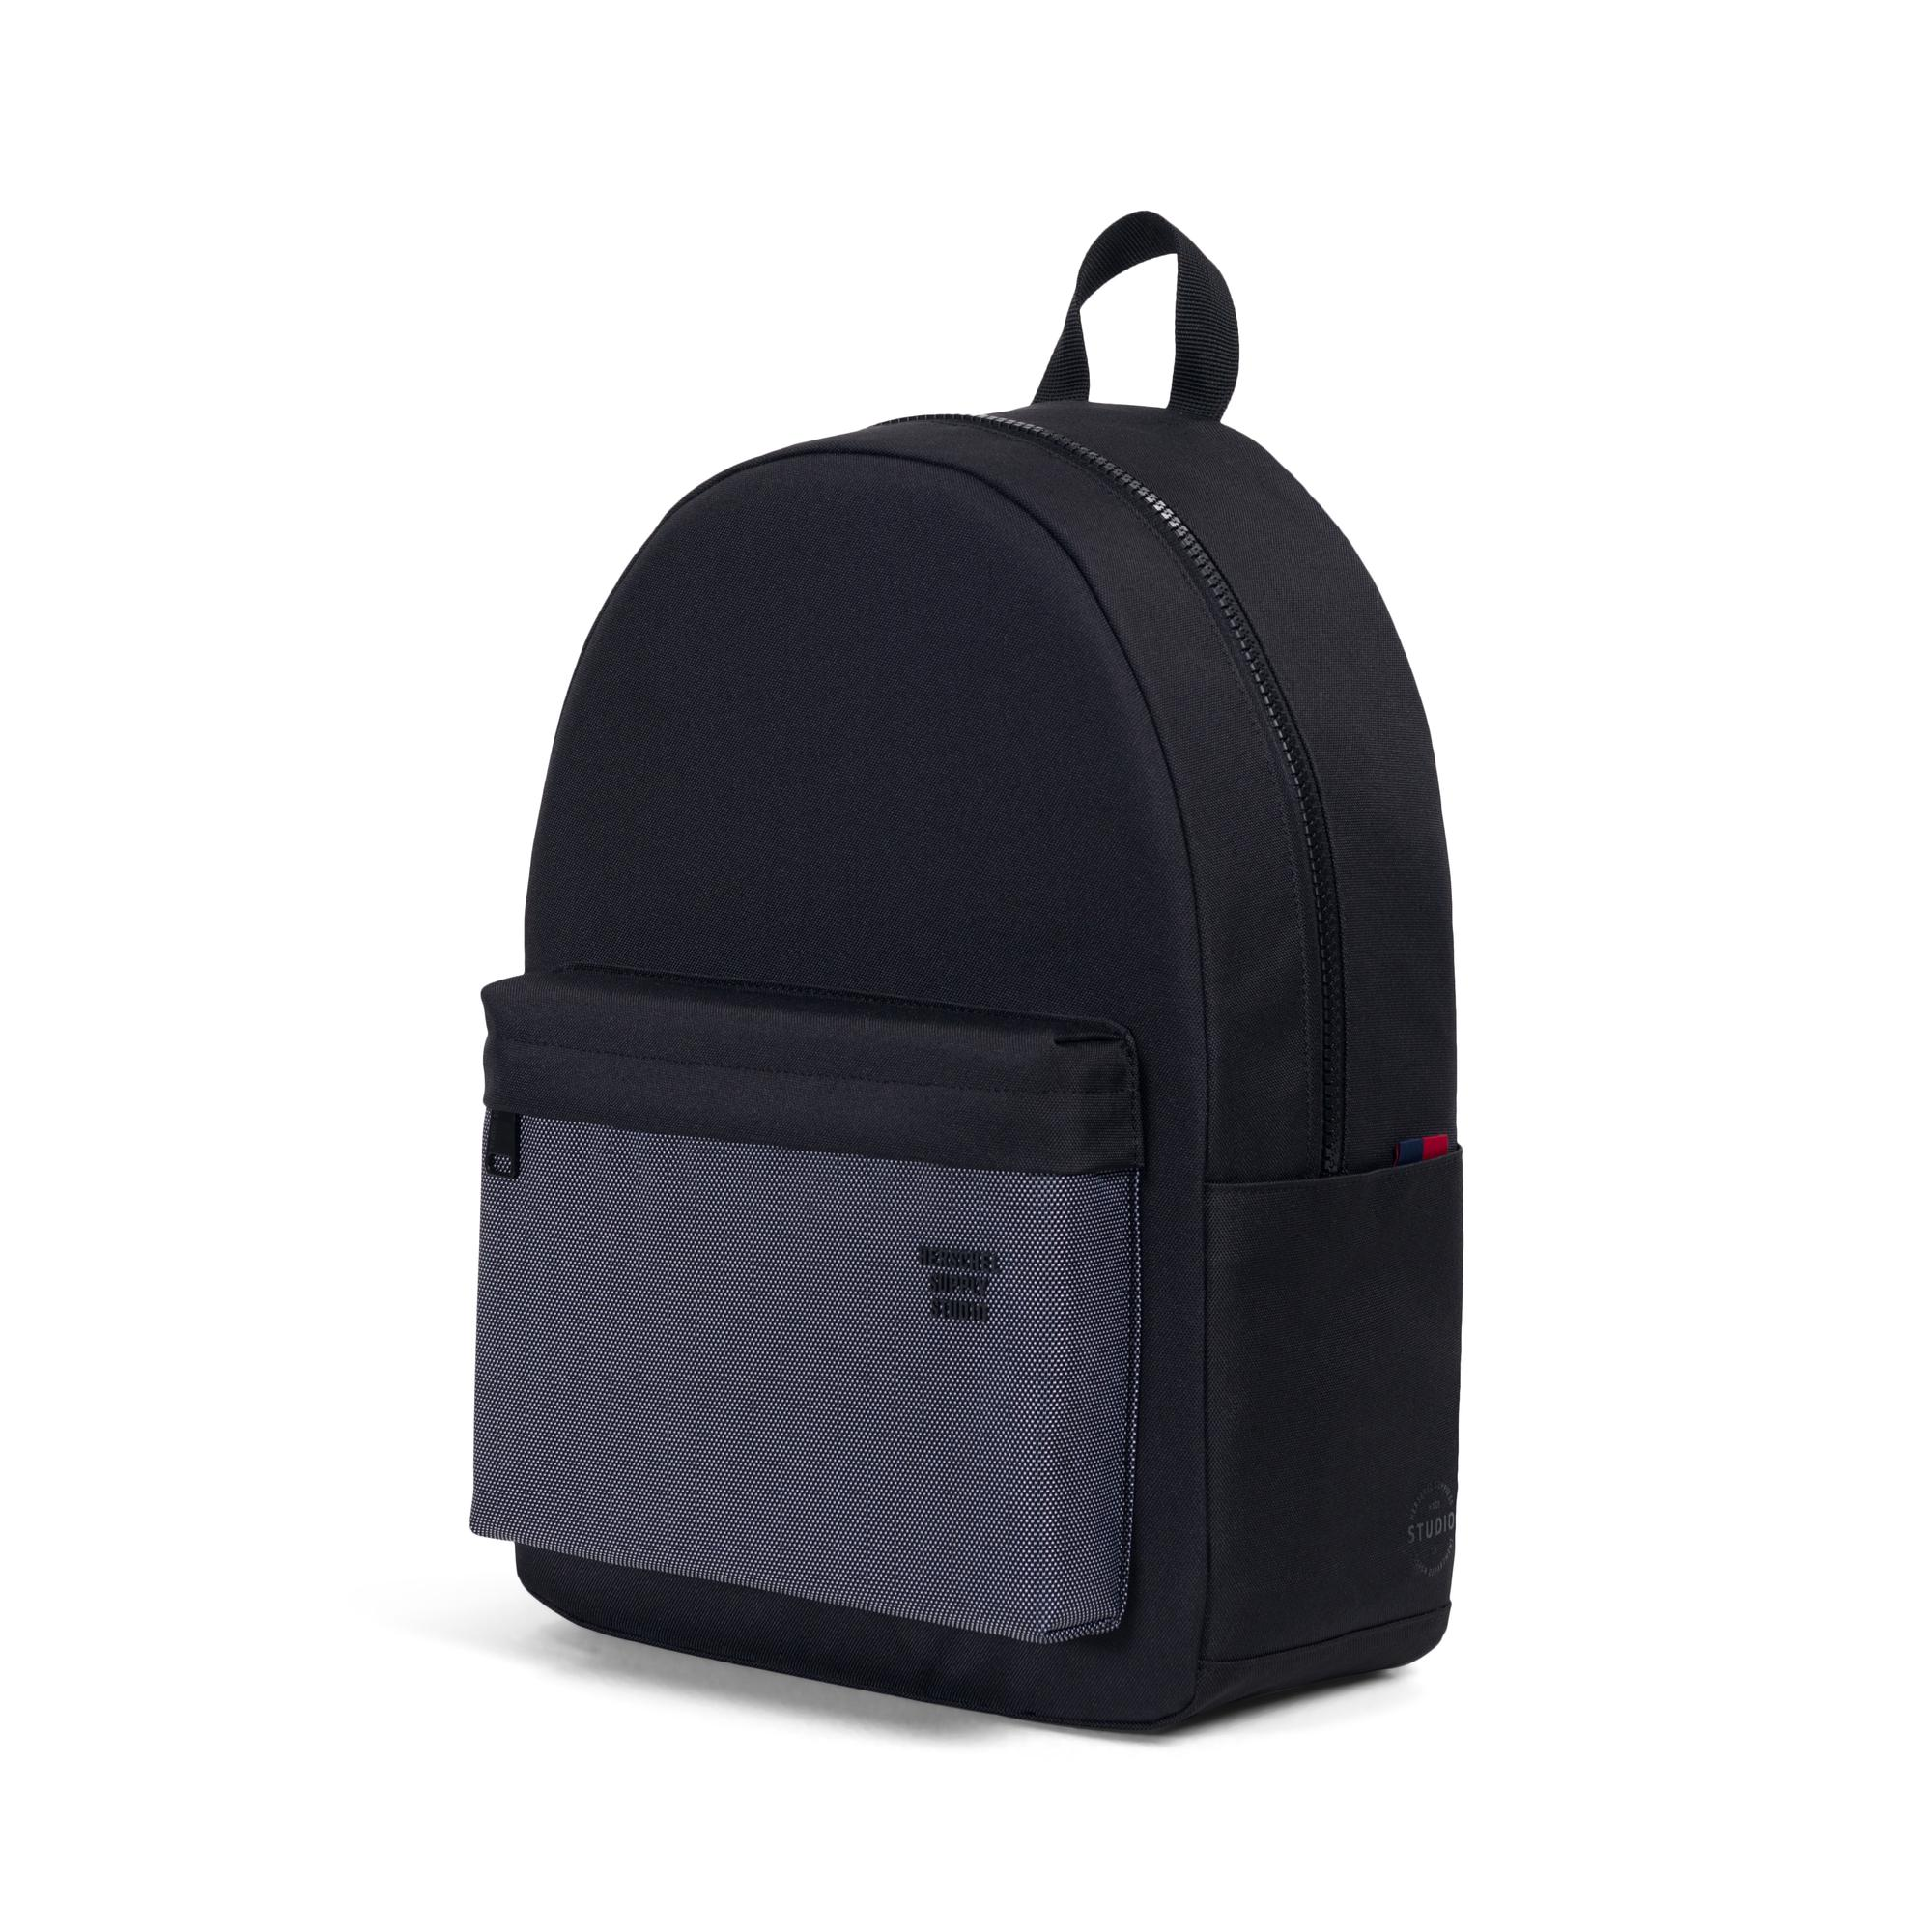 Winlaw Backpack XL Studio  e9200a9f4c069